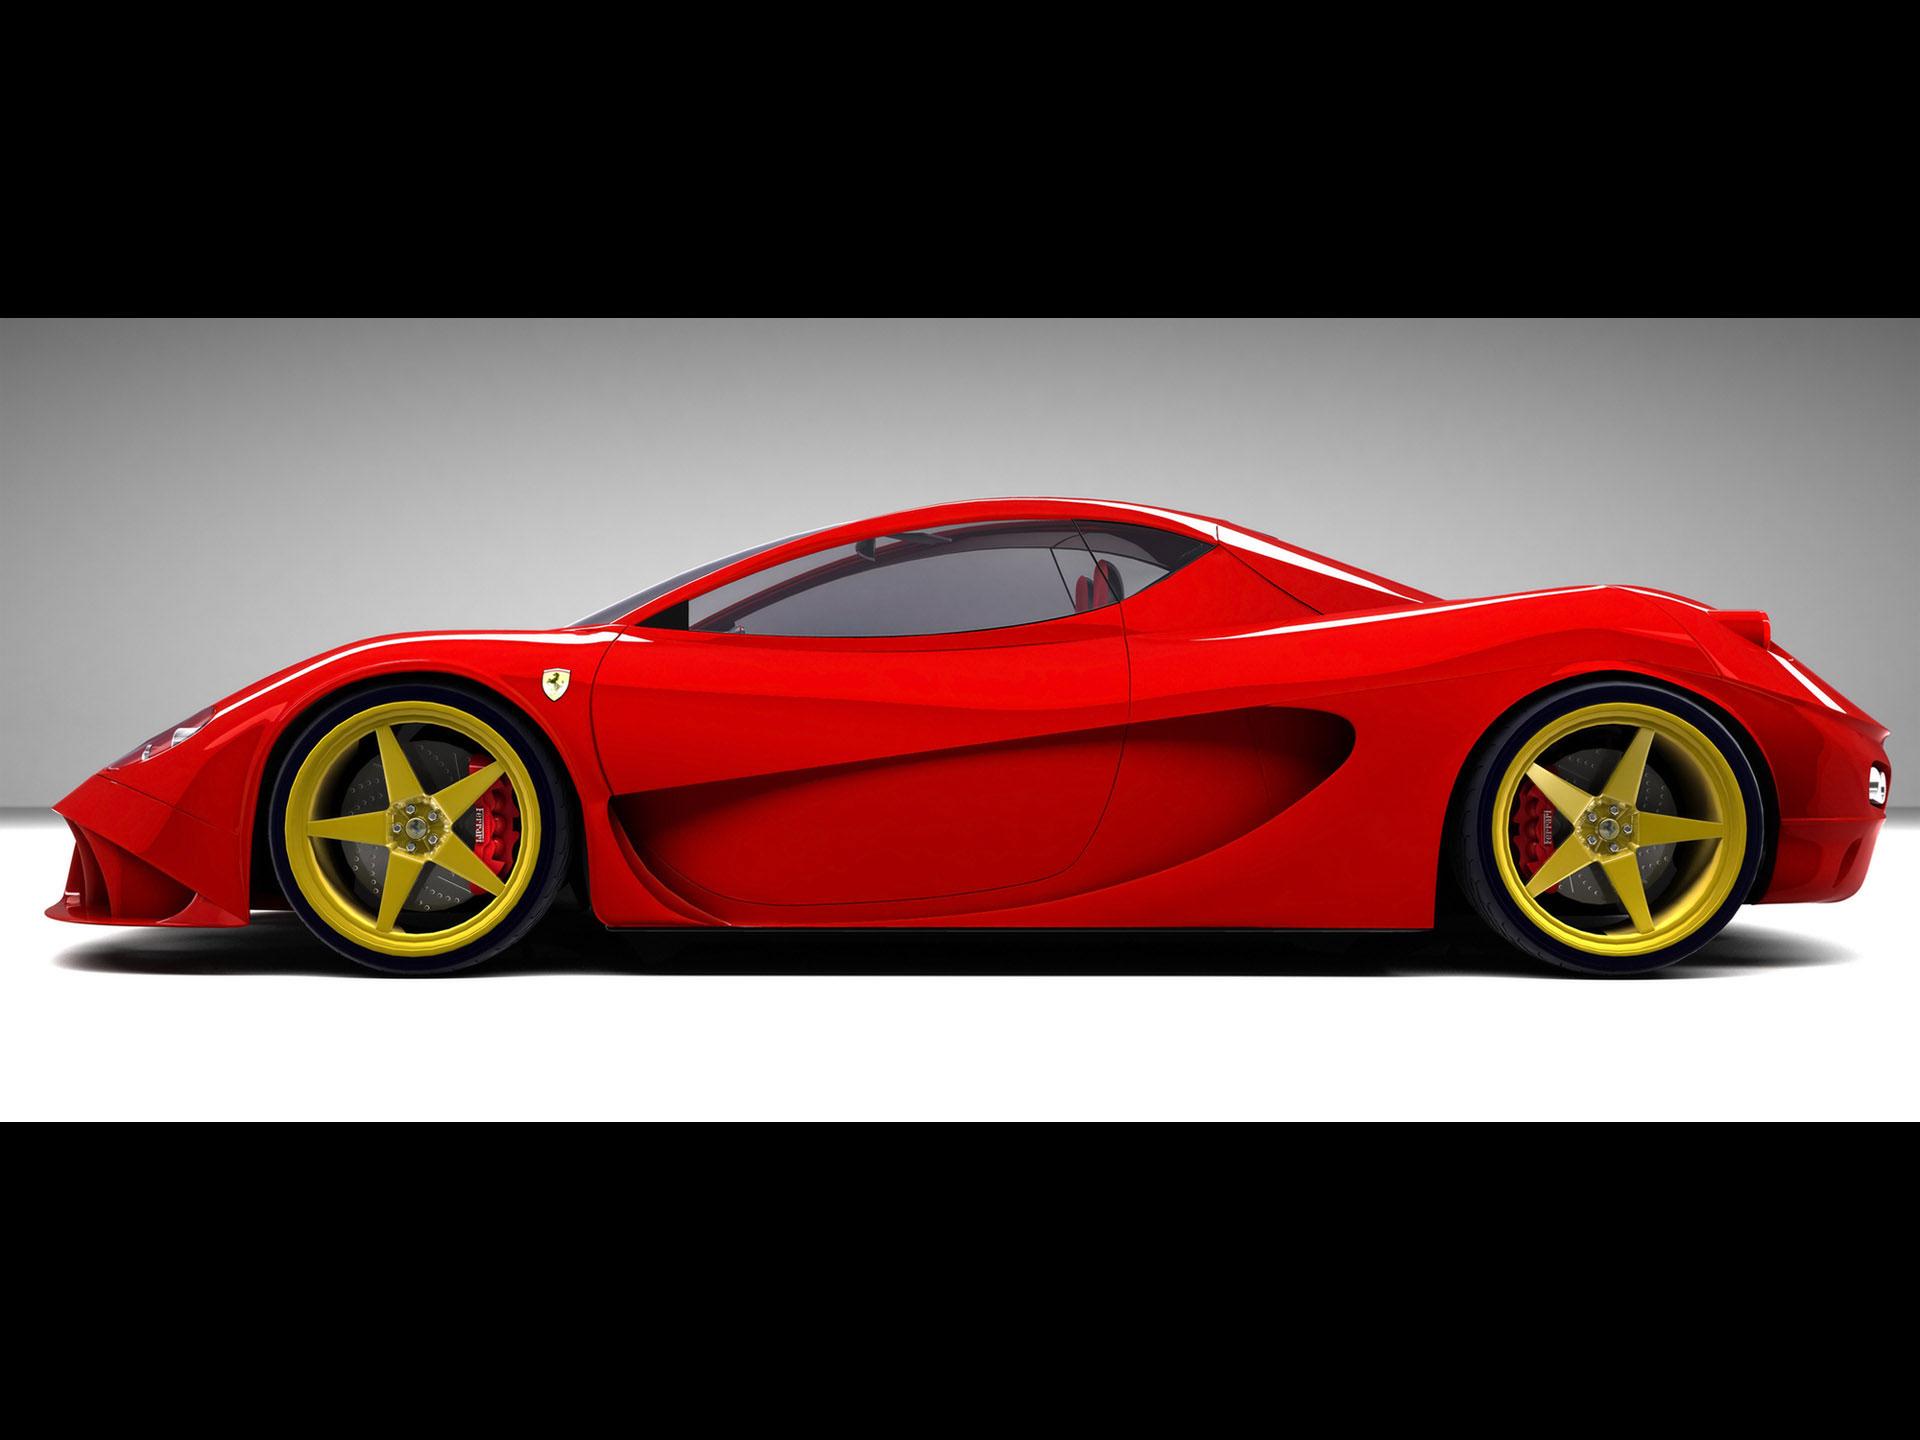 Wallpaper Ferrari World Cars Wallpapers Background